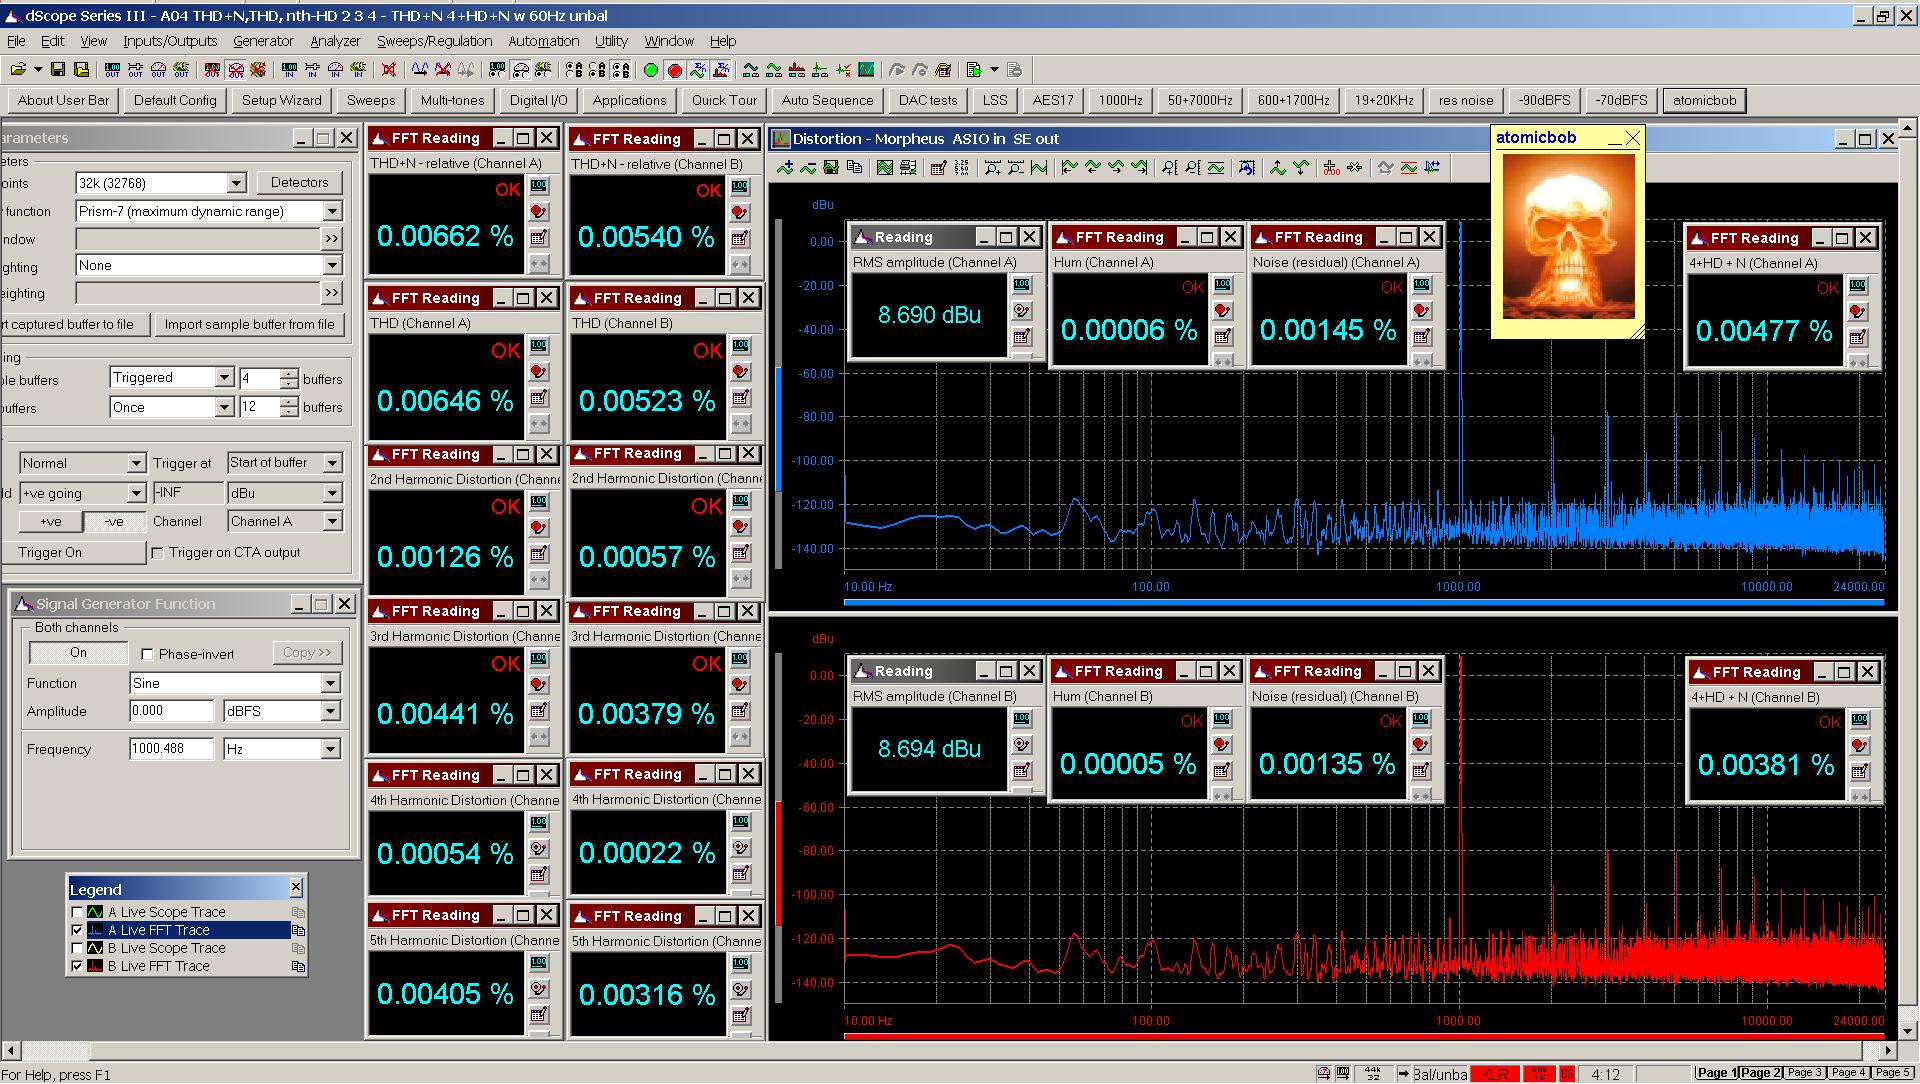 20200717 morpheus A04 THD+N THD nth-HD 4+HD+N 60Hz FFT SE 0dBFS - USB.png